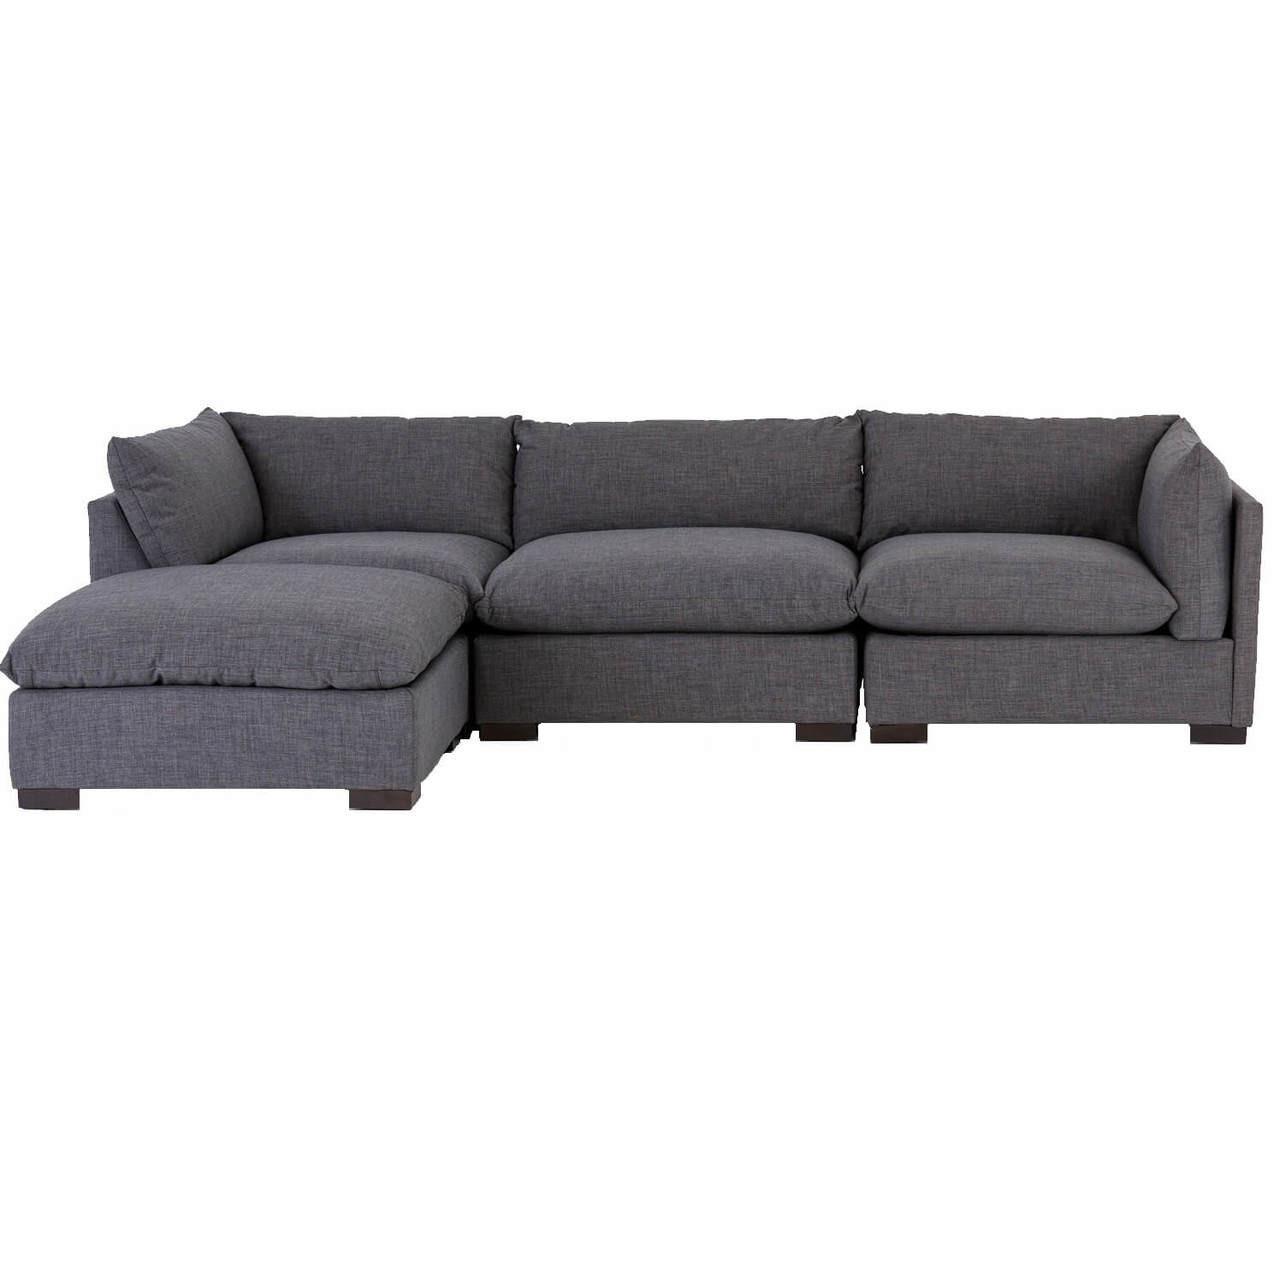 Westworld Modern Gray 4-Piece Modular Lounge Sectional Sofa